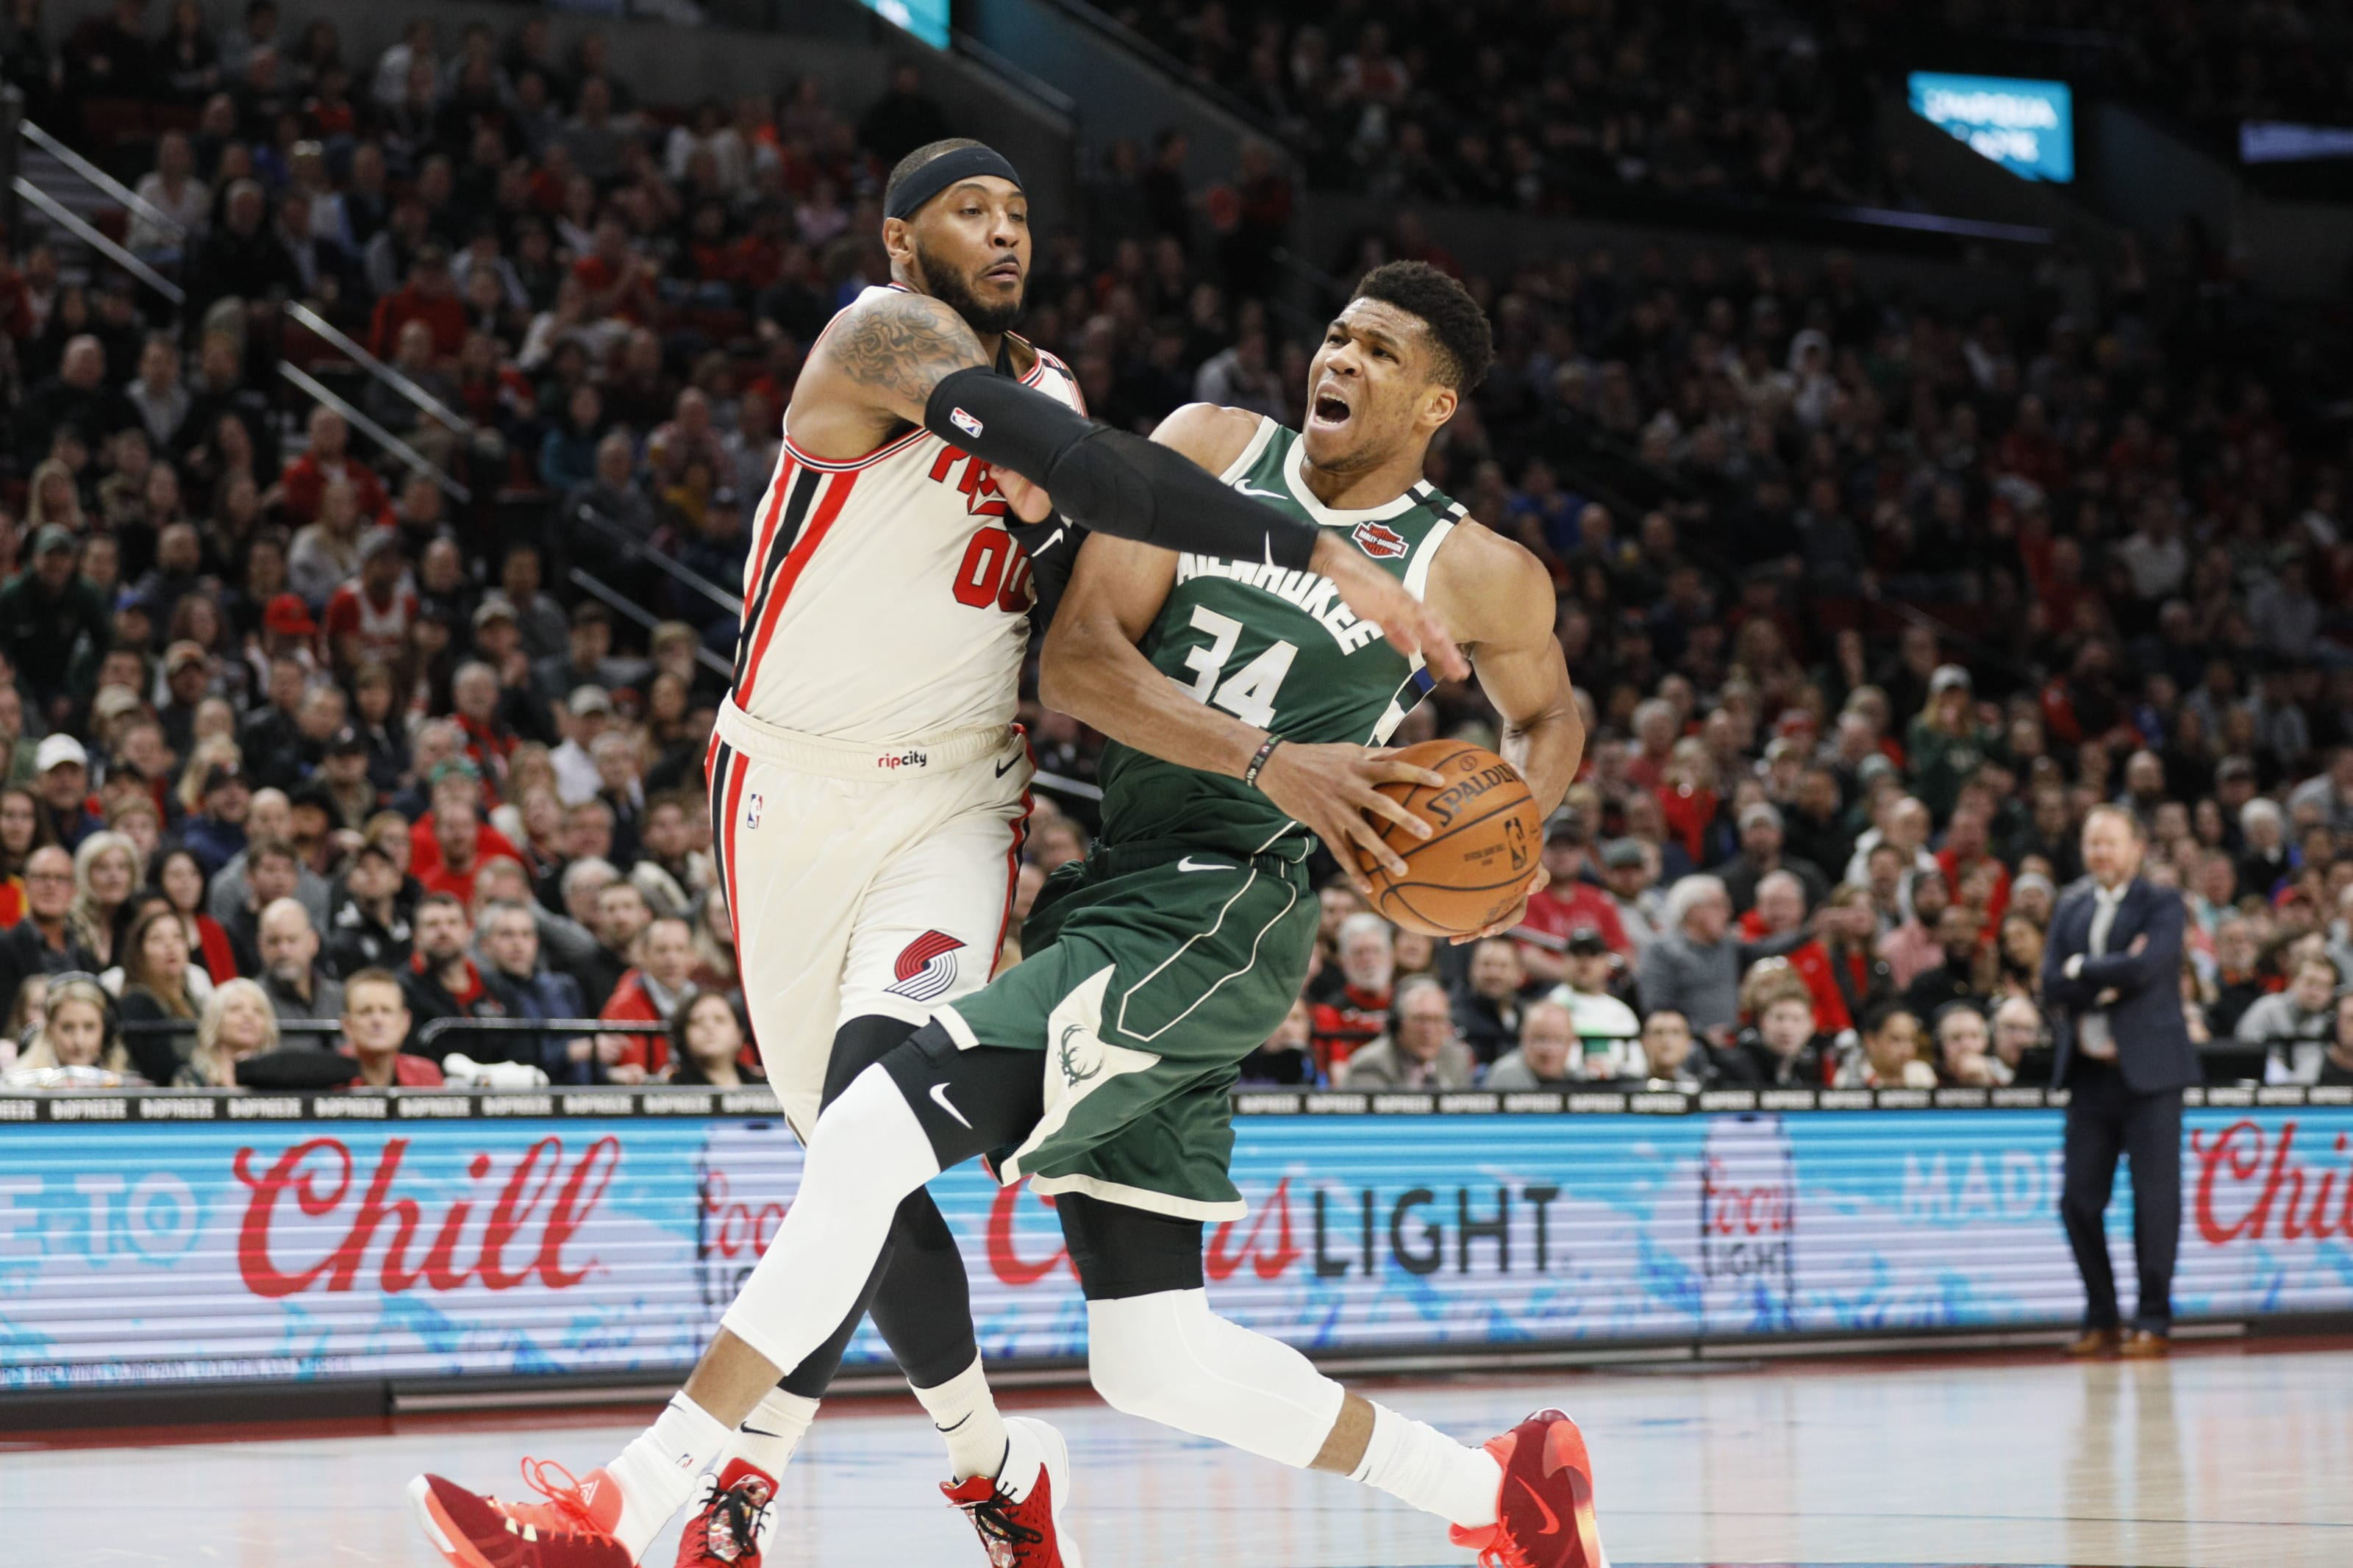 Milwaukee Bucks: Giannis Antetokounmpo, Portland Trail Blazers: Carmelo Anthony